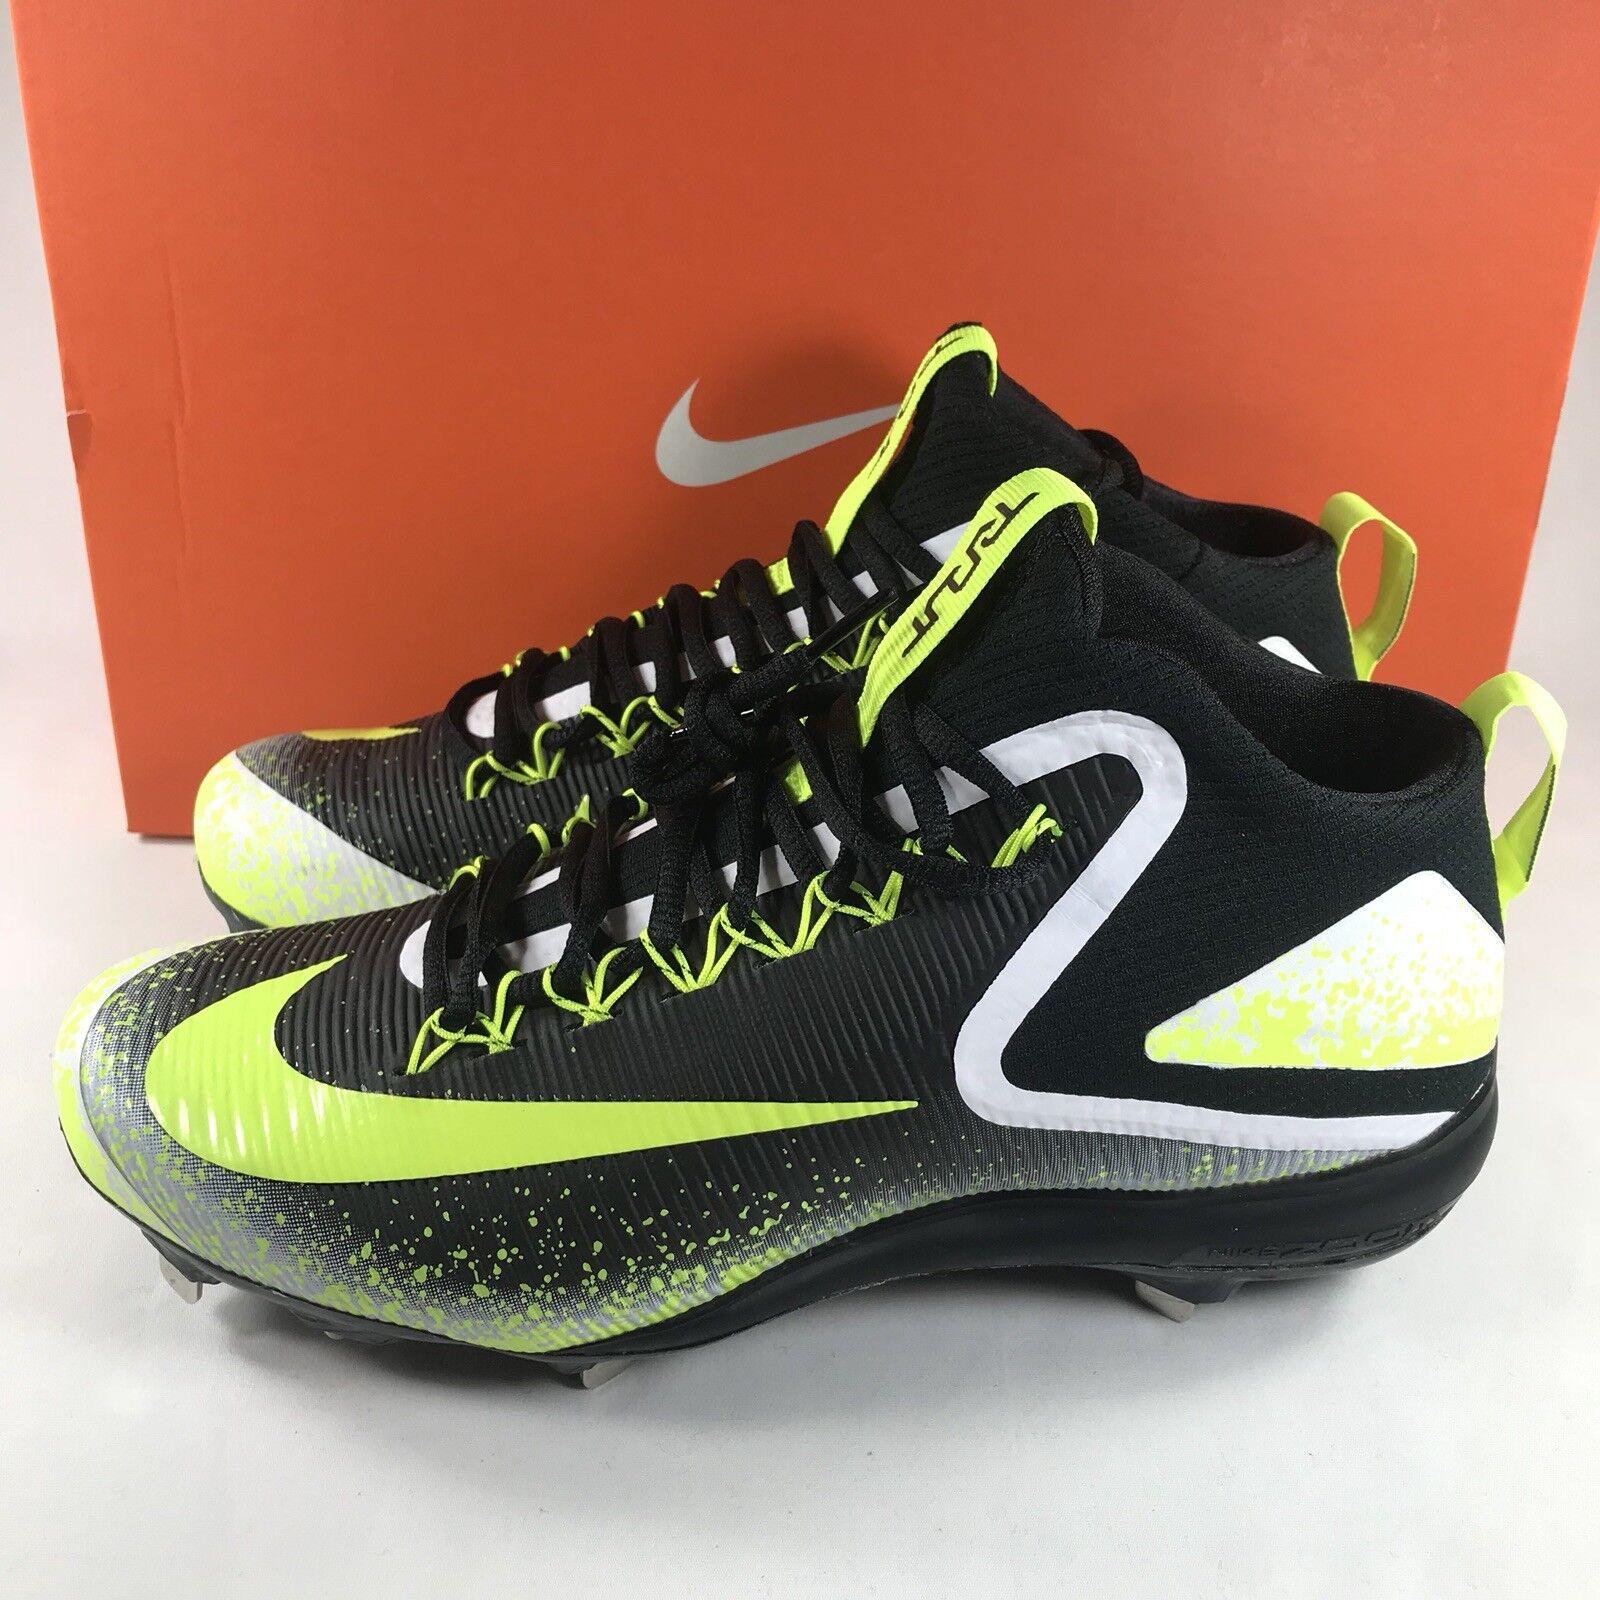 Nike Zoom Trout 3 Metal Baseball Cleats Men's Sz 9.5 Black Volt White 856503-071